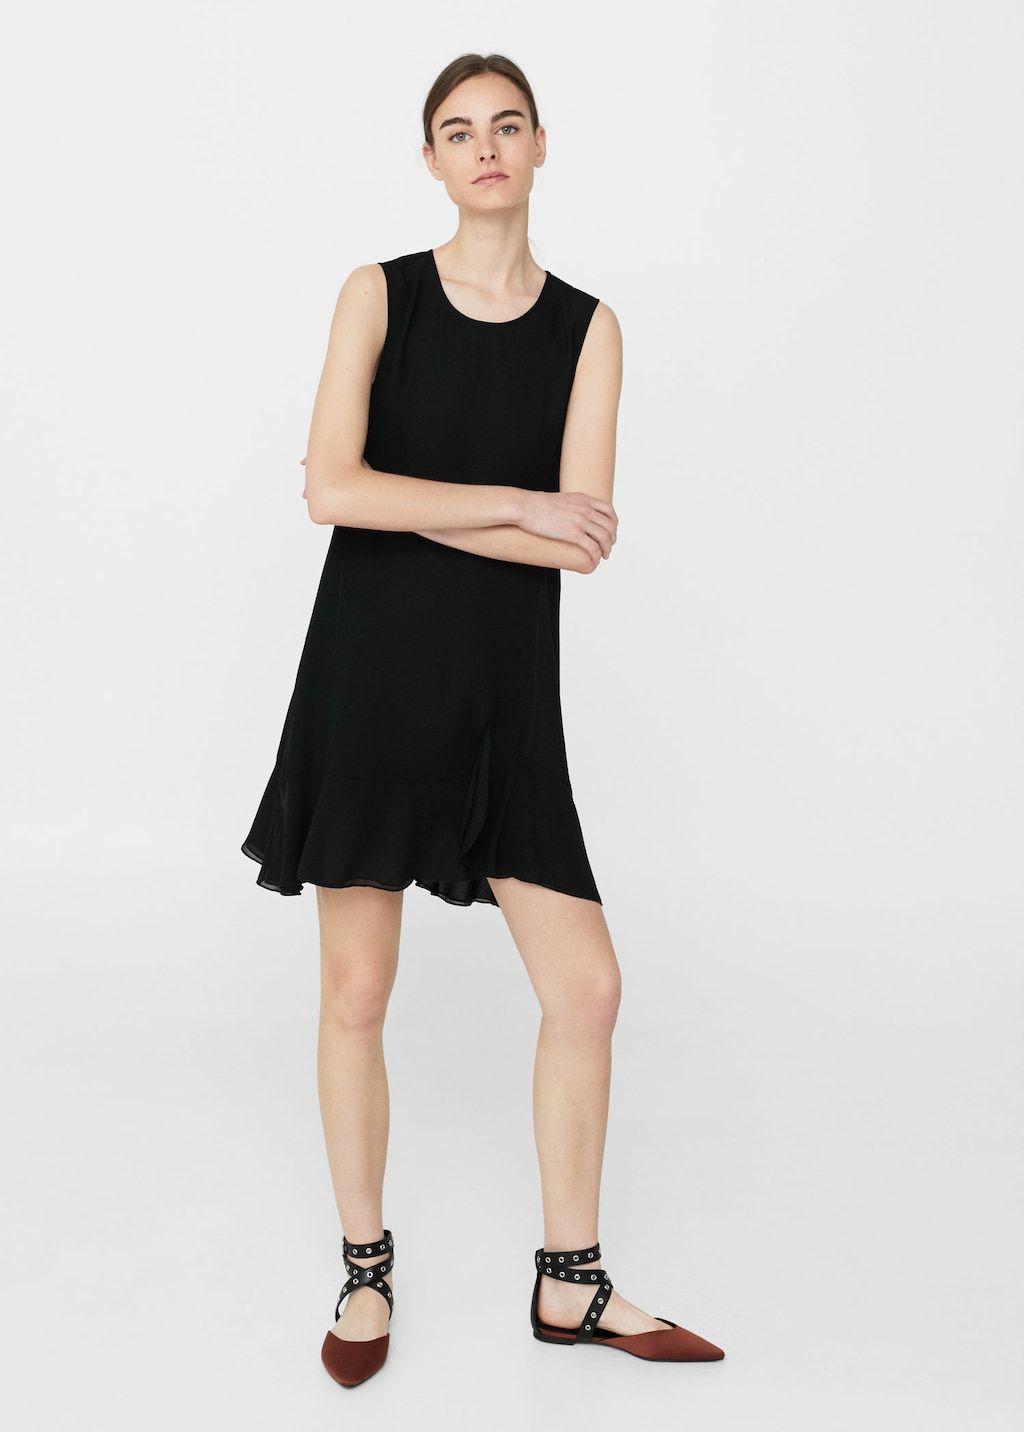 a7f322a15889 Flowy ruffled dress - Women | Clothing | Dresses, Ruffle dress, Fashion